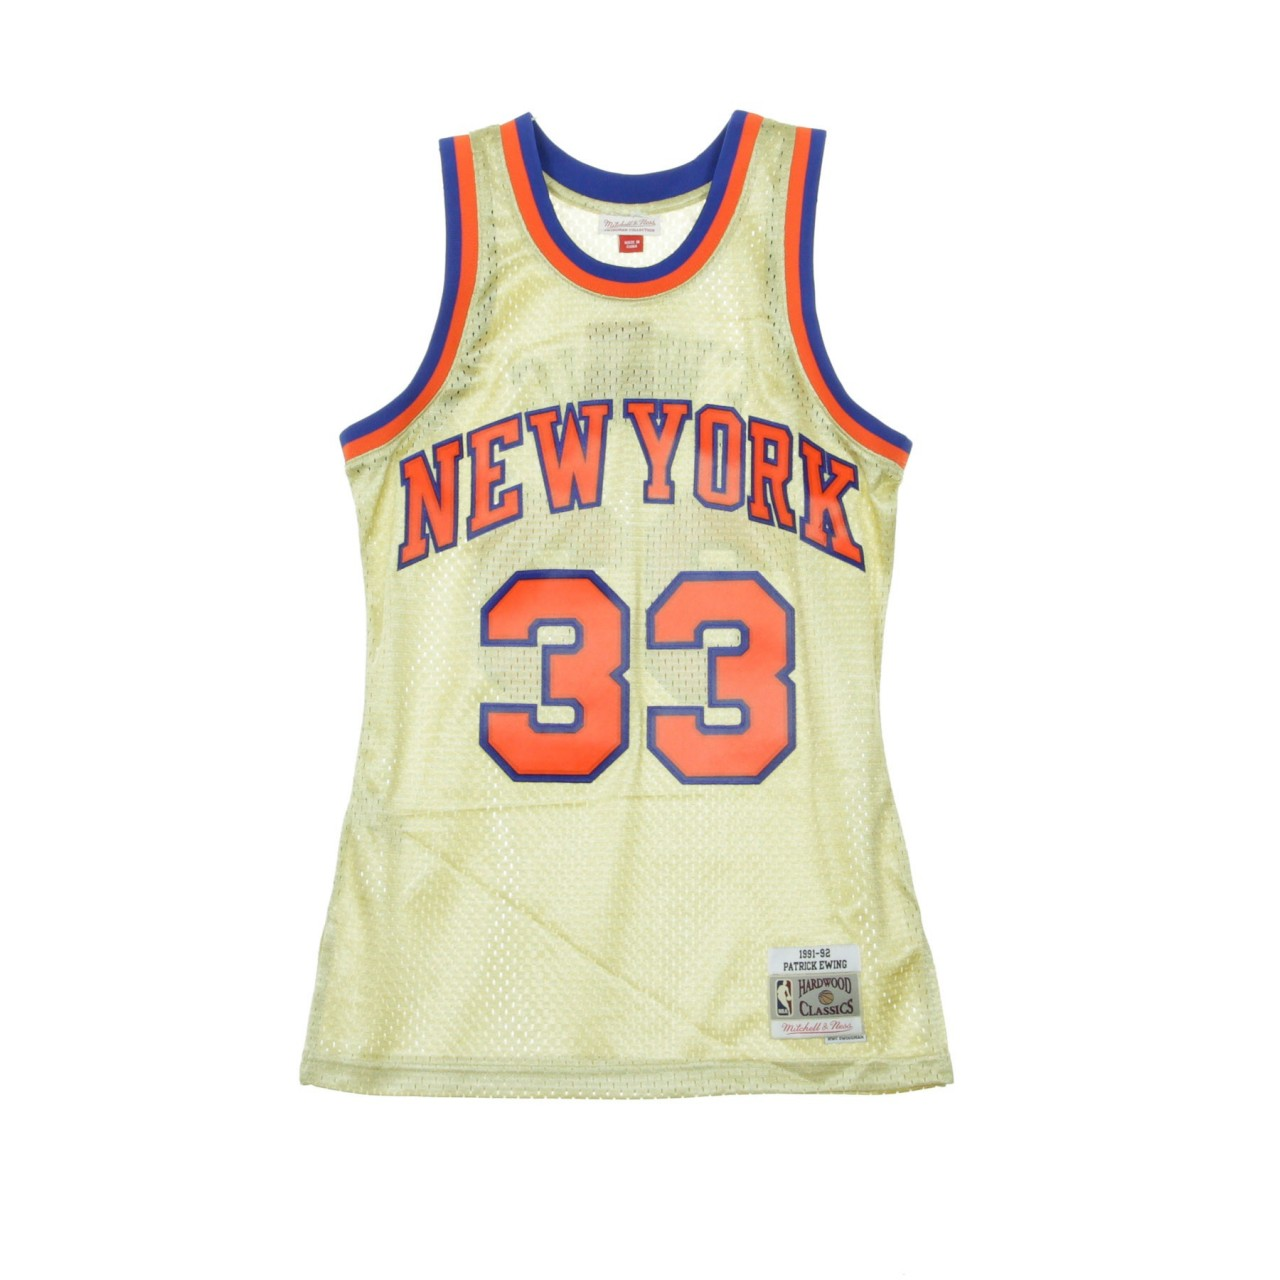 MITCHELL & NESS NBA SWIMGMAN JERSEY PATRICK EWING NO.33 1991-92 NEYKNI GOLD BA895H-NYK-D-L3R